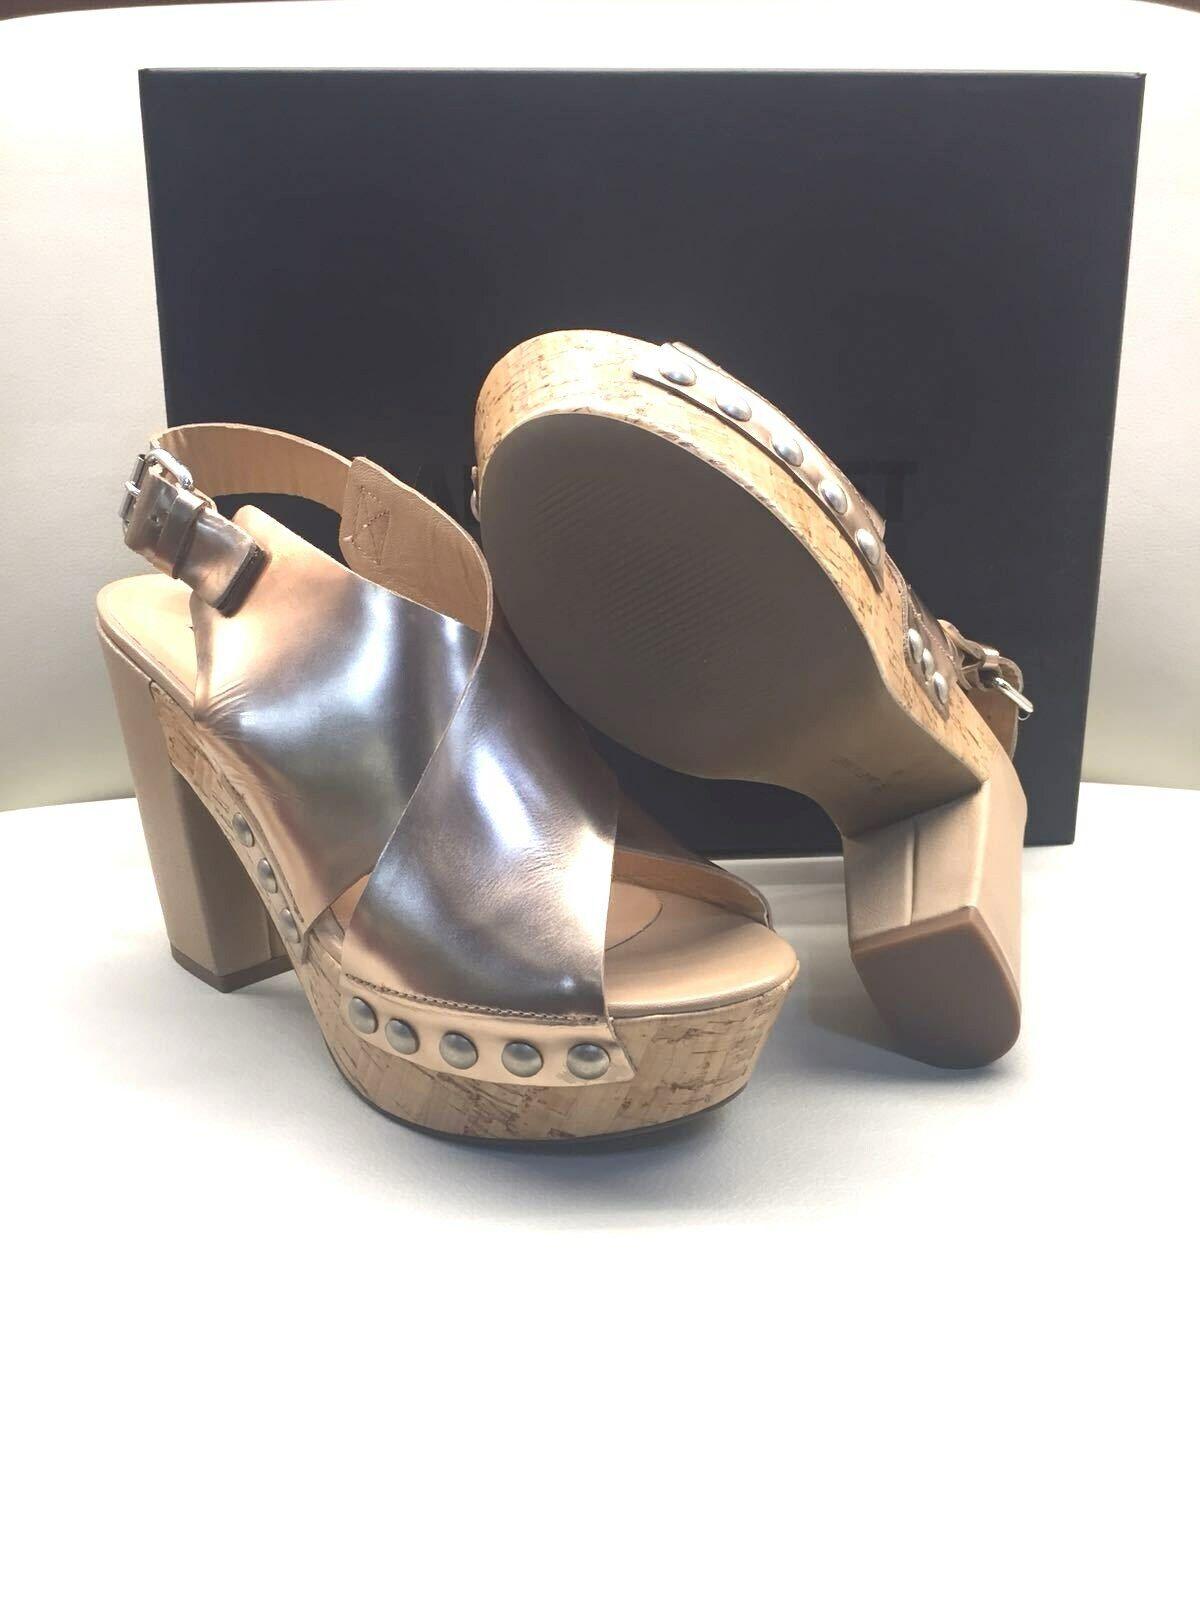 Sandalo   Janet & Janet  mod.37401 595     SCONTO - 40%